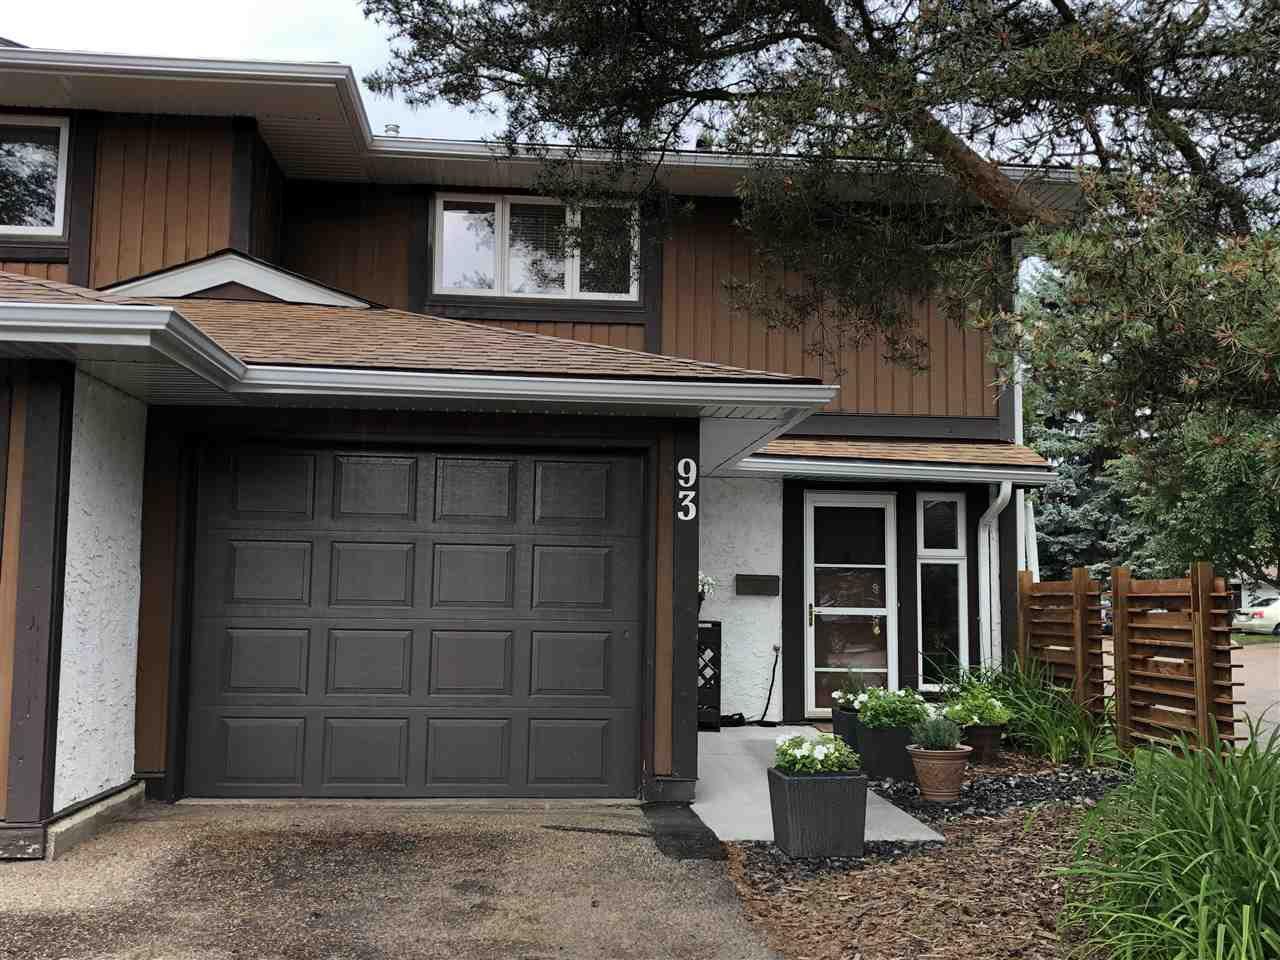 Main Photo: 93 HEARTHSTONE Road in Edmonton: Zone 14 Townhouse for sale : MLS®# E4205844